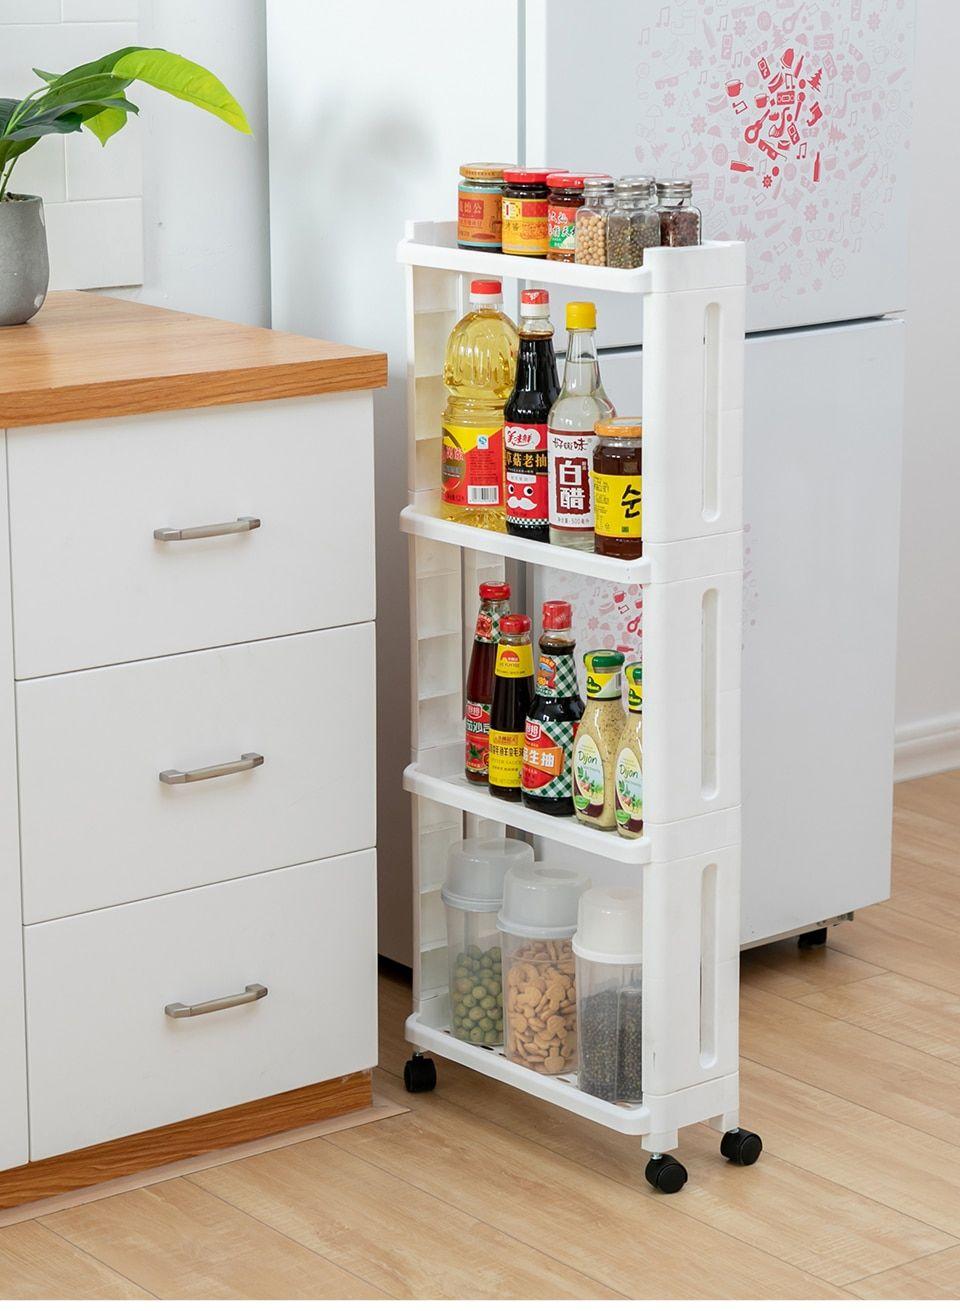 The Goods For Kitchen Storage Rack Fridge Side Shelf 2 3 4 Layer